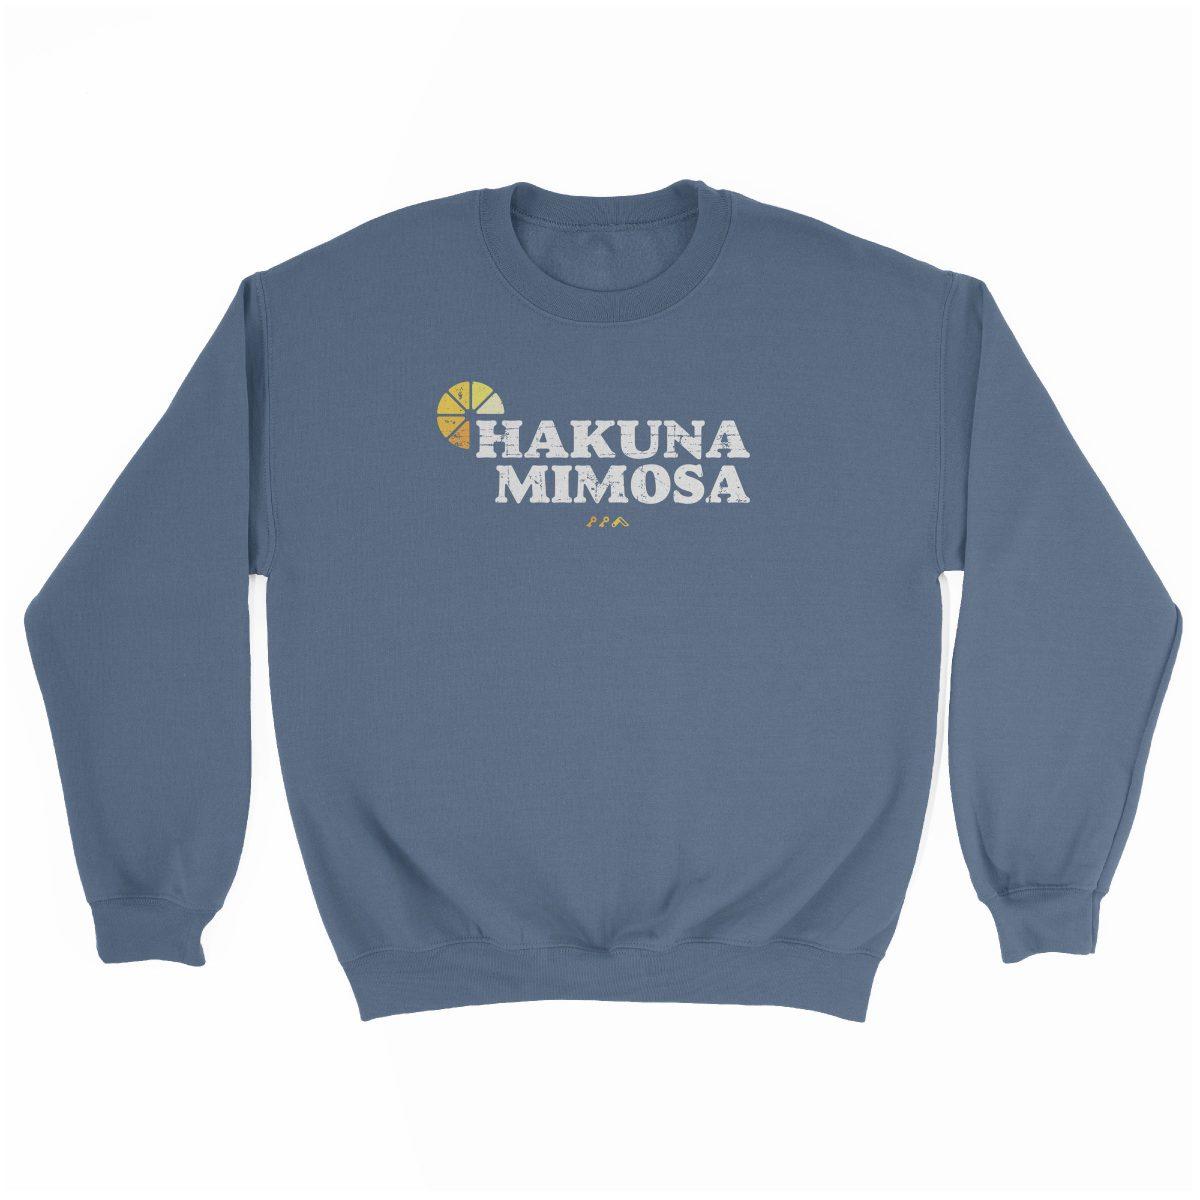 HAKUNA MIMOSA funny sunday funday brunch sweatshirt in indigo at kikicutt.com